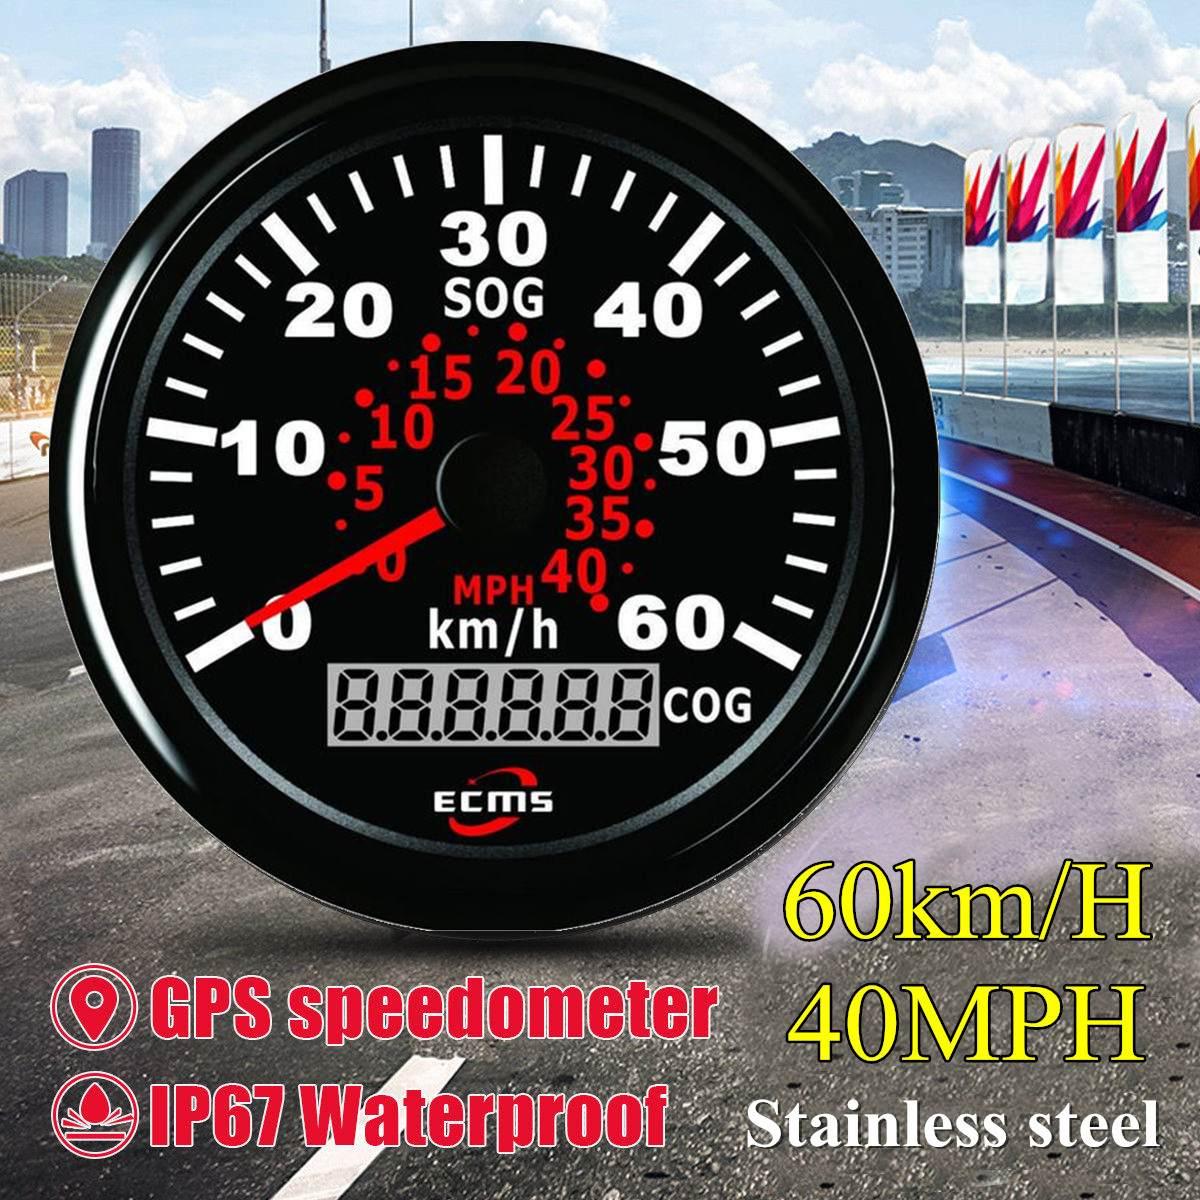 85mm Auto Car Truck Marine GPS Speedometer Waterproof Speed Sensor Meter Gauge Digital Odometer Automobiles Replacement Parts 3